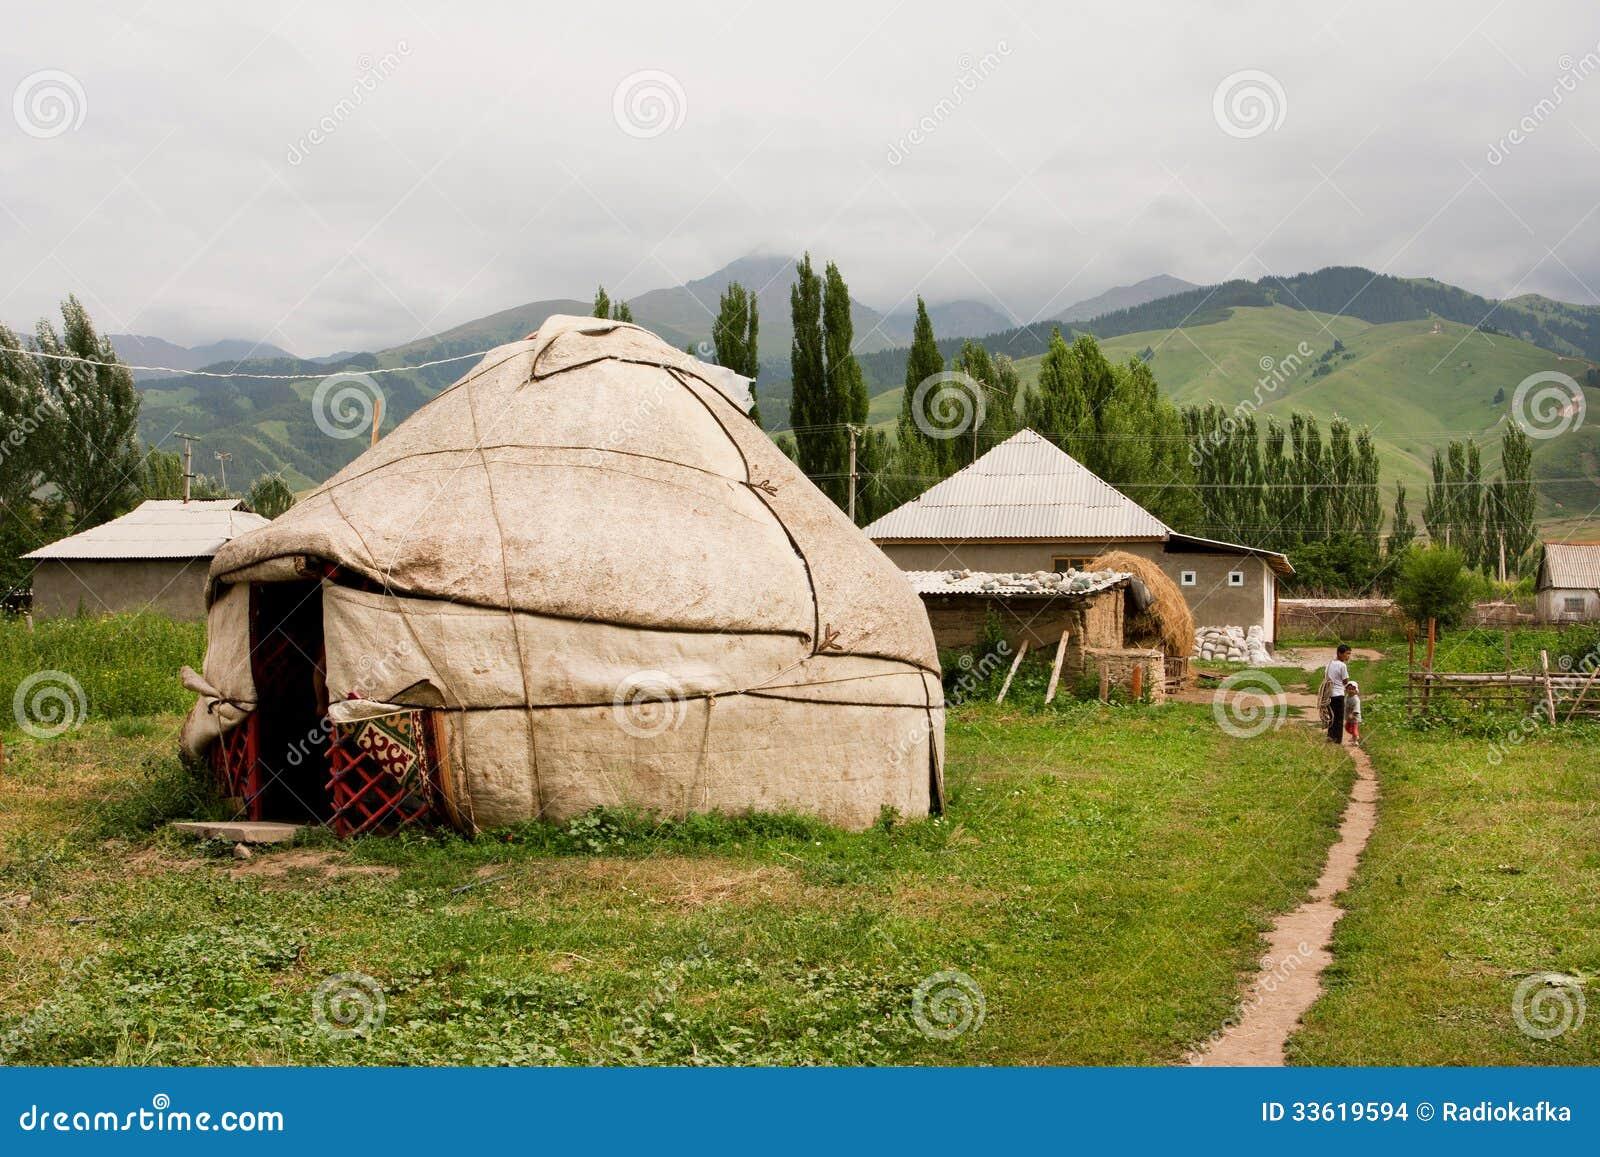 Children Go Away Past Central Asian Yurt Village House